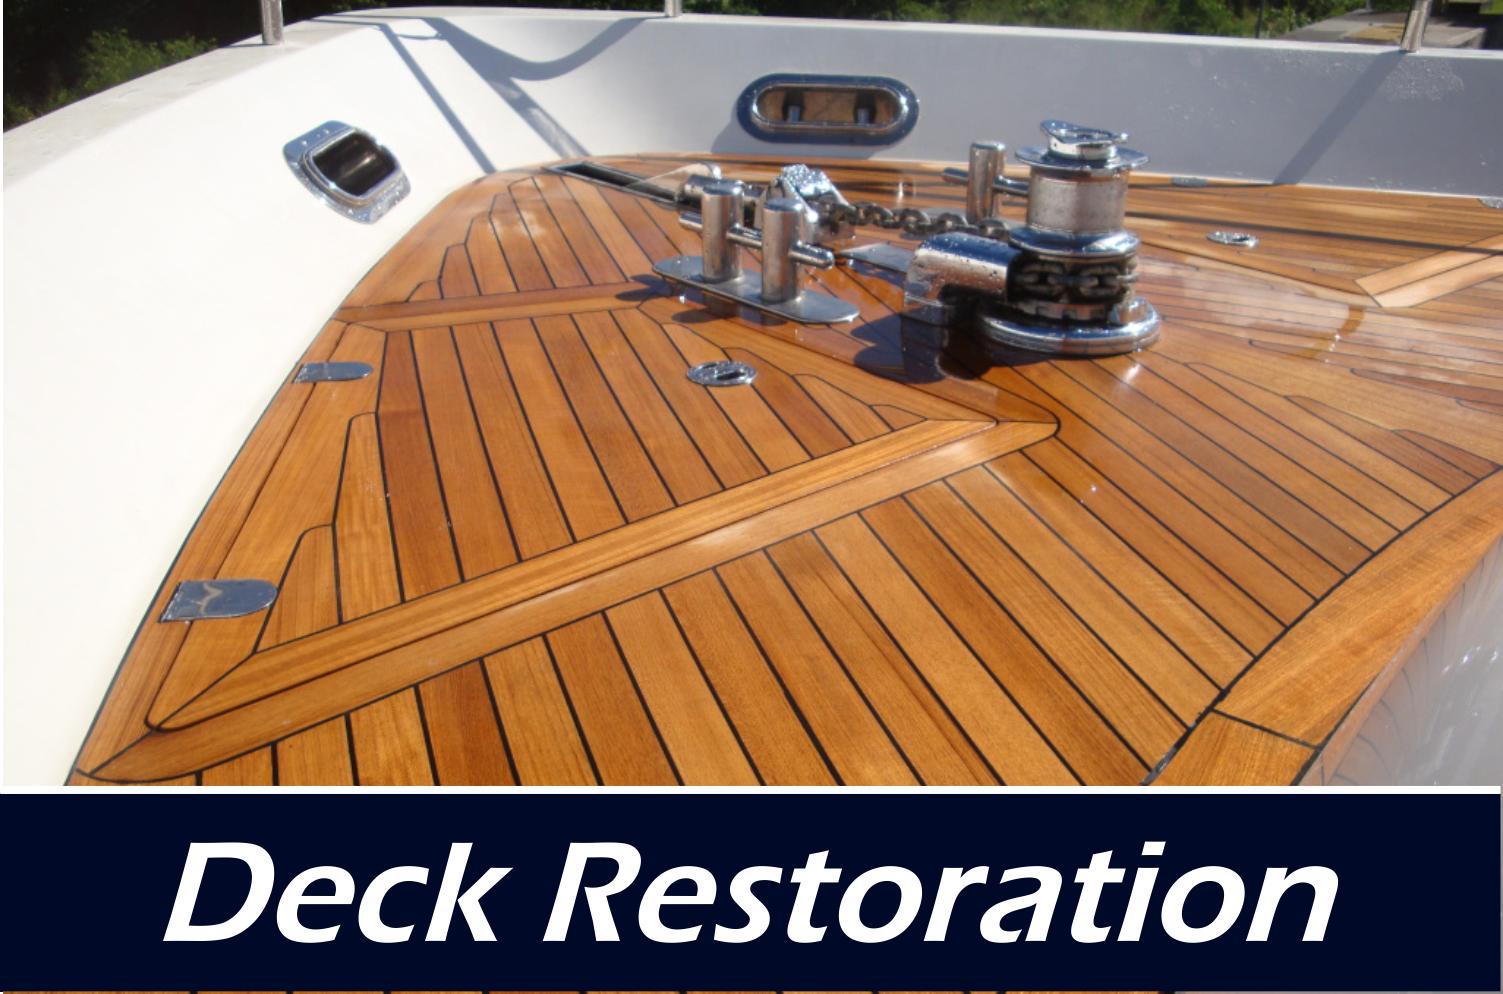 topside and teak deck repair restoration paint varnish wood shop mazatlan mexico